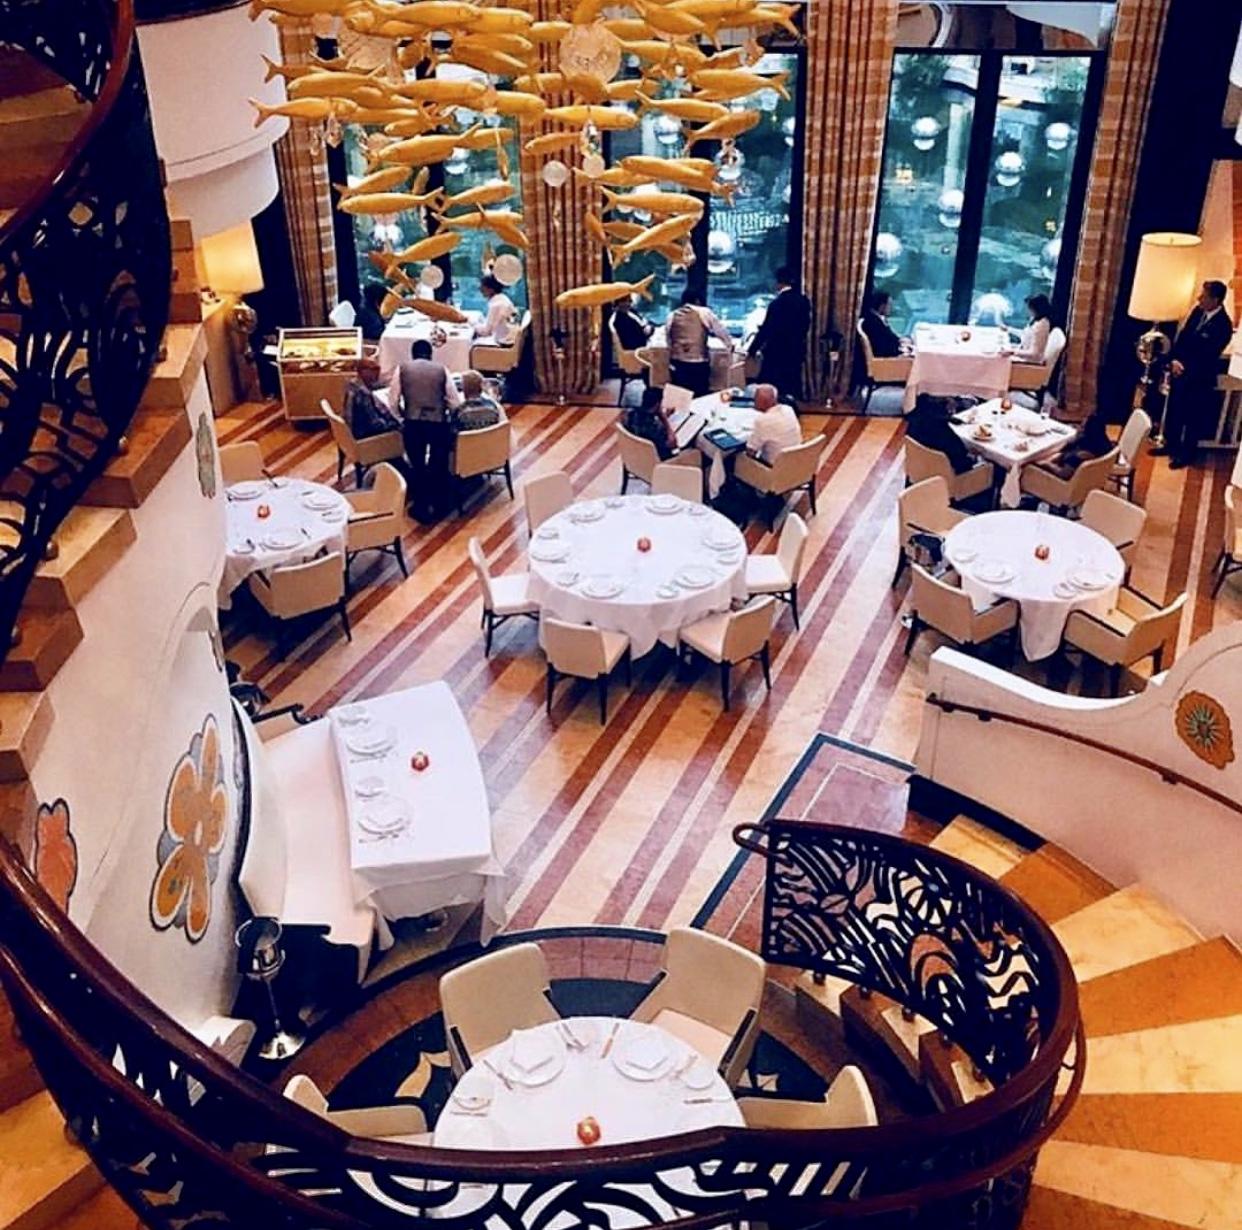 wynn-hotel-las-vegas-travel-blogger